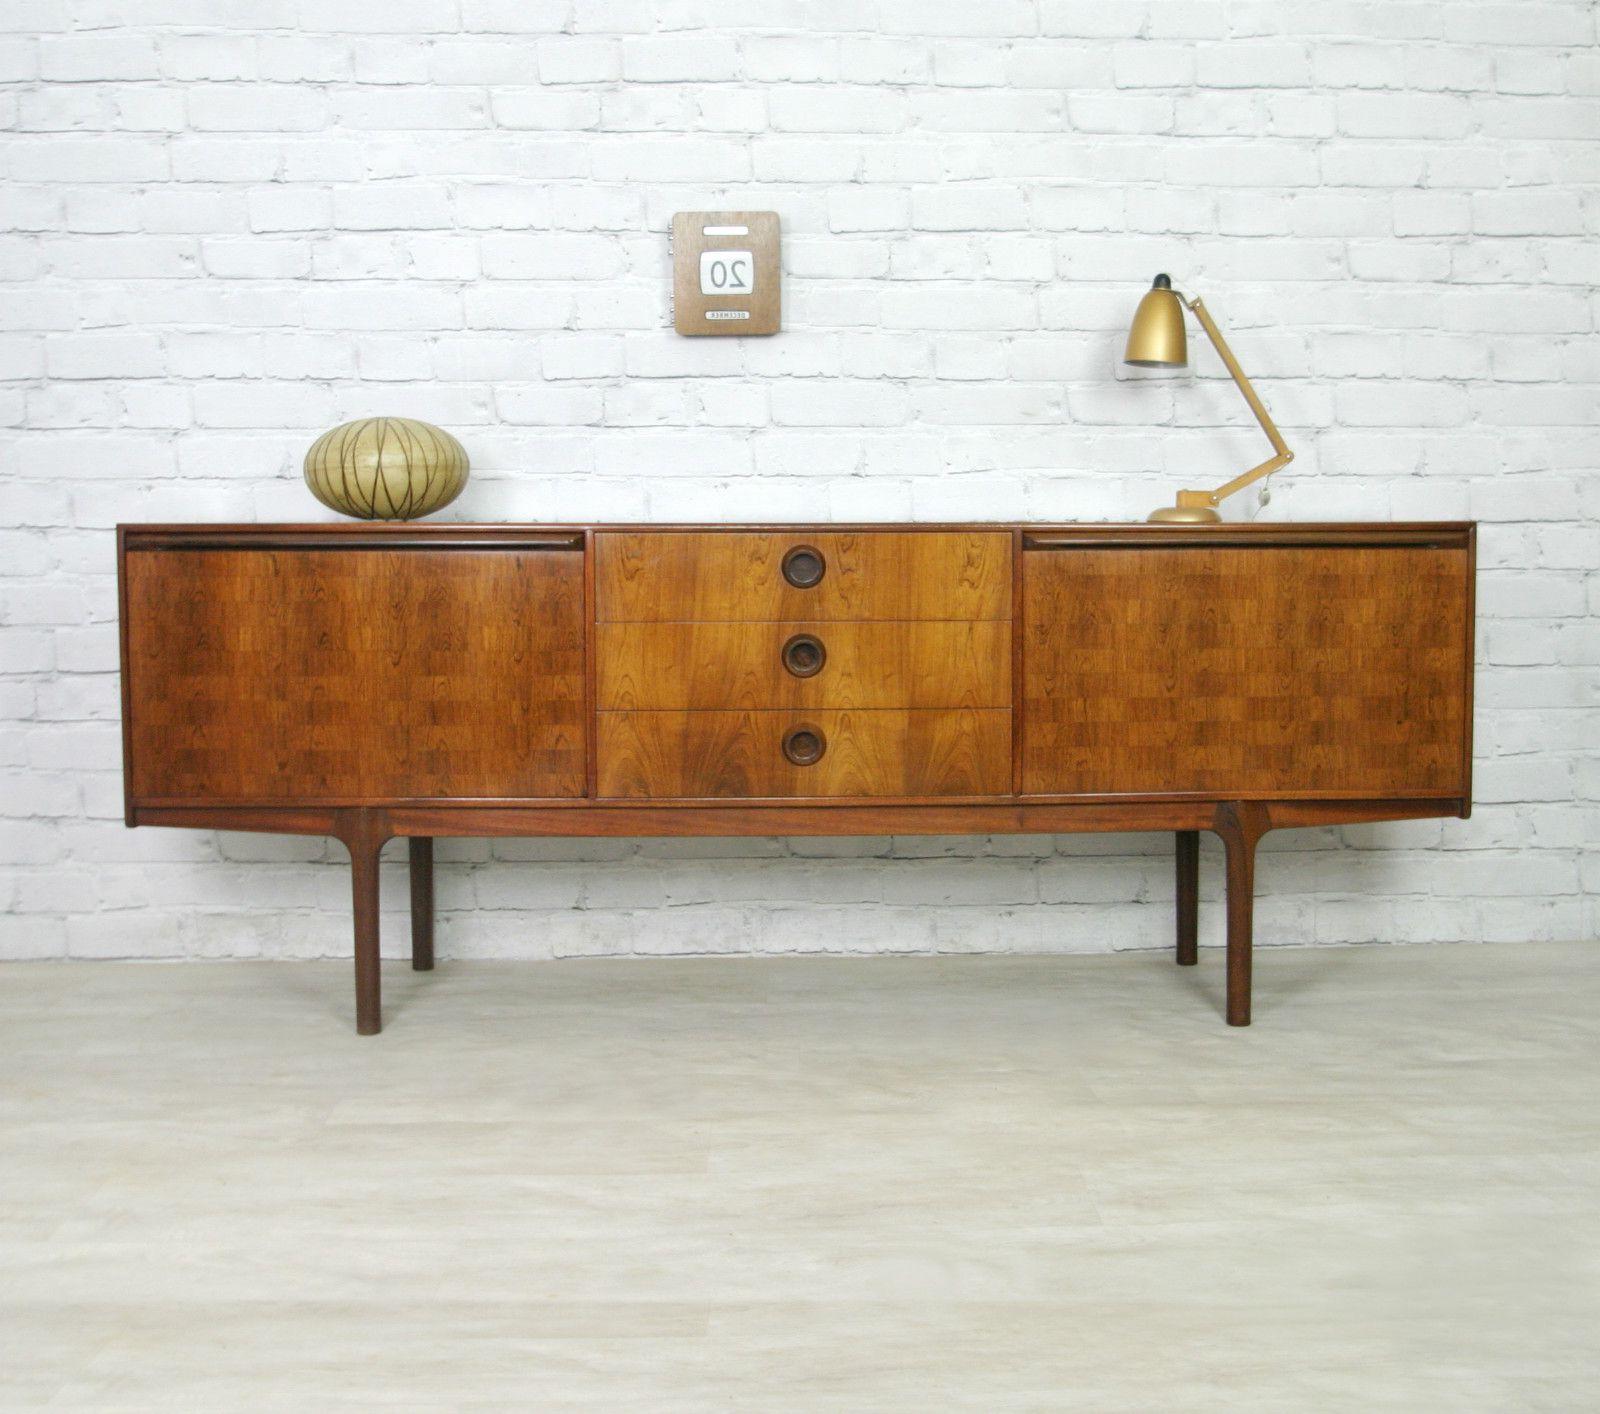 Mcintosh Rosewood Retro Vintage Teak Mid Century Danish In Mid Century Modern Scandinavian Style Buffets (View 10 of 20)